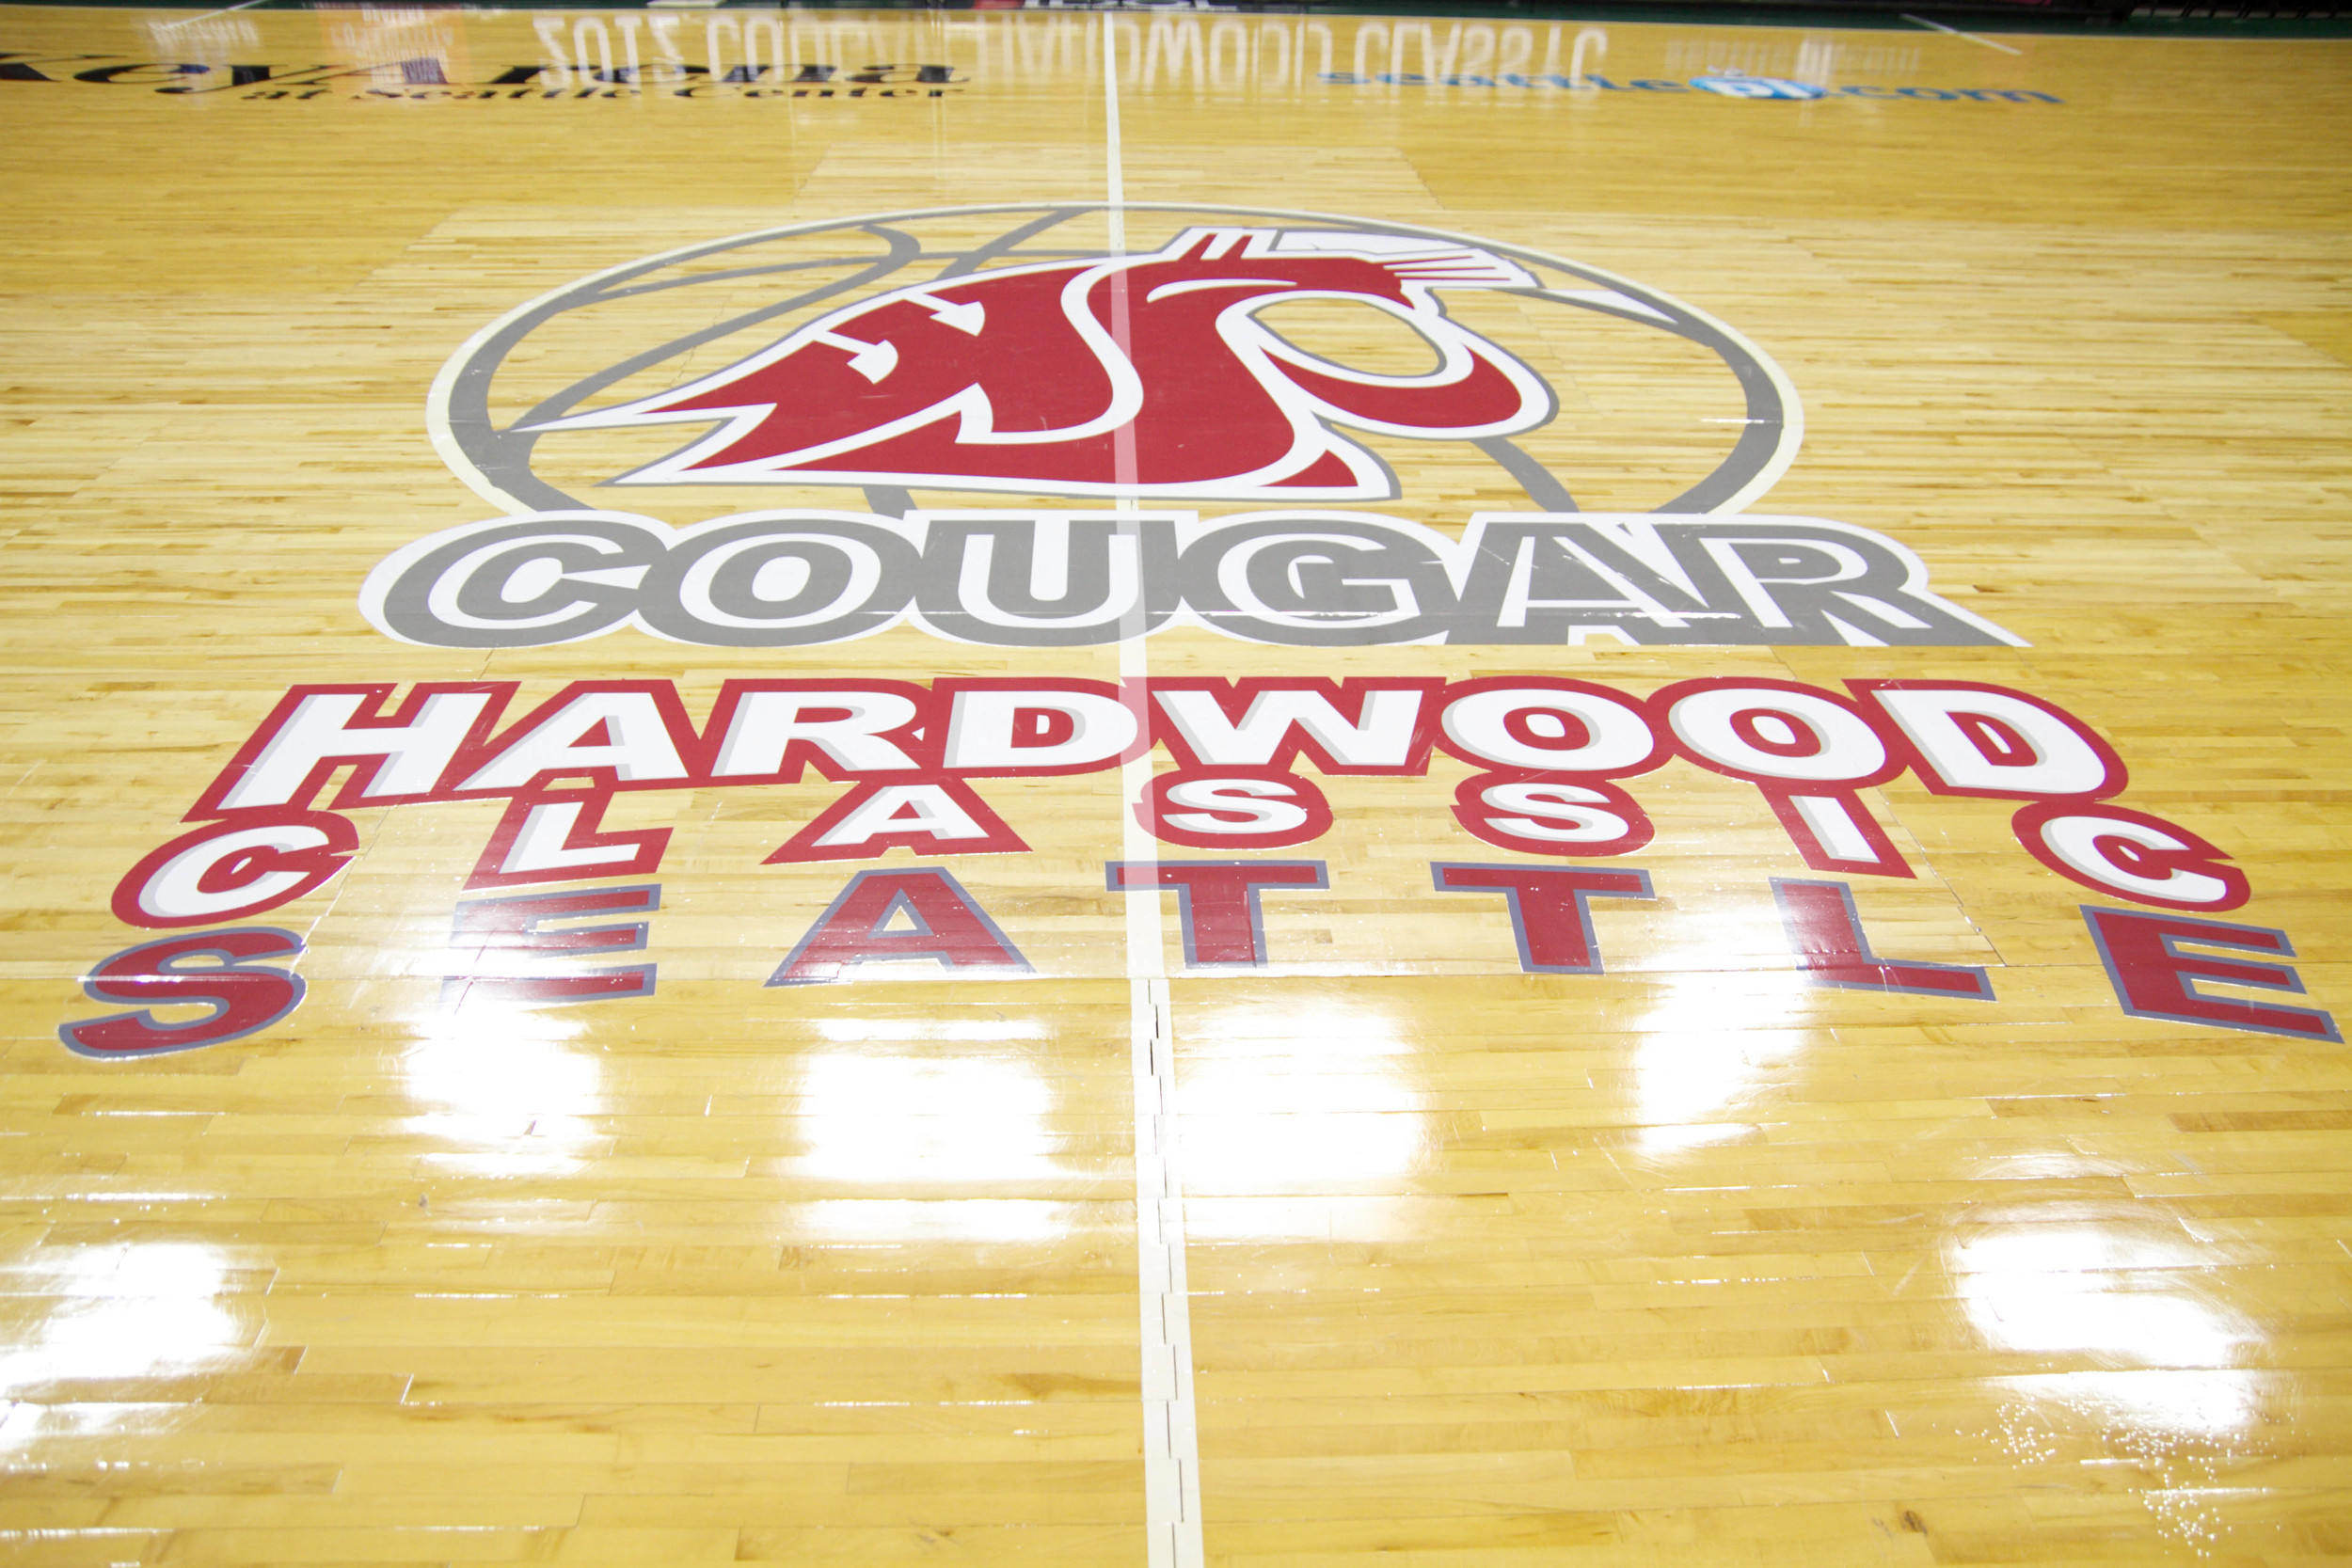 2012 Cougar Hardwood Classic - Court.jpg